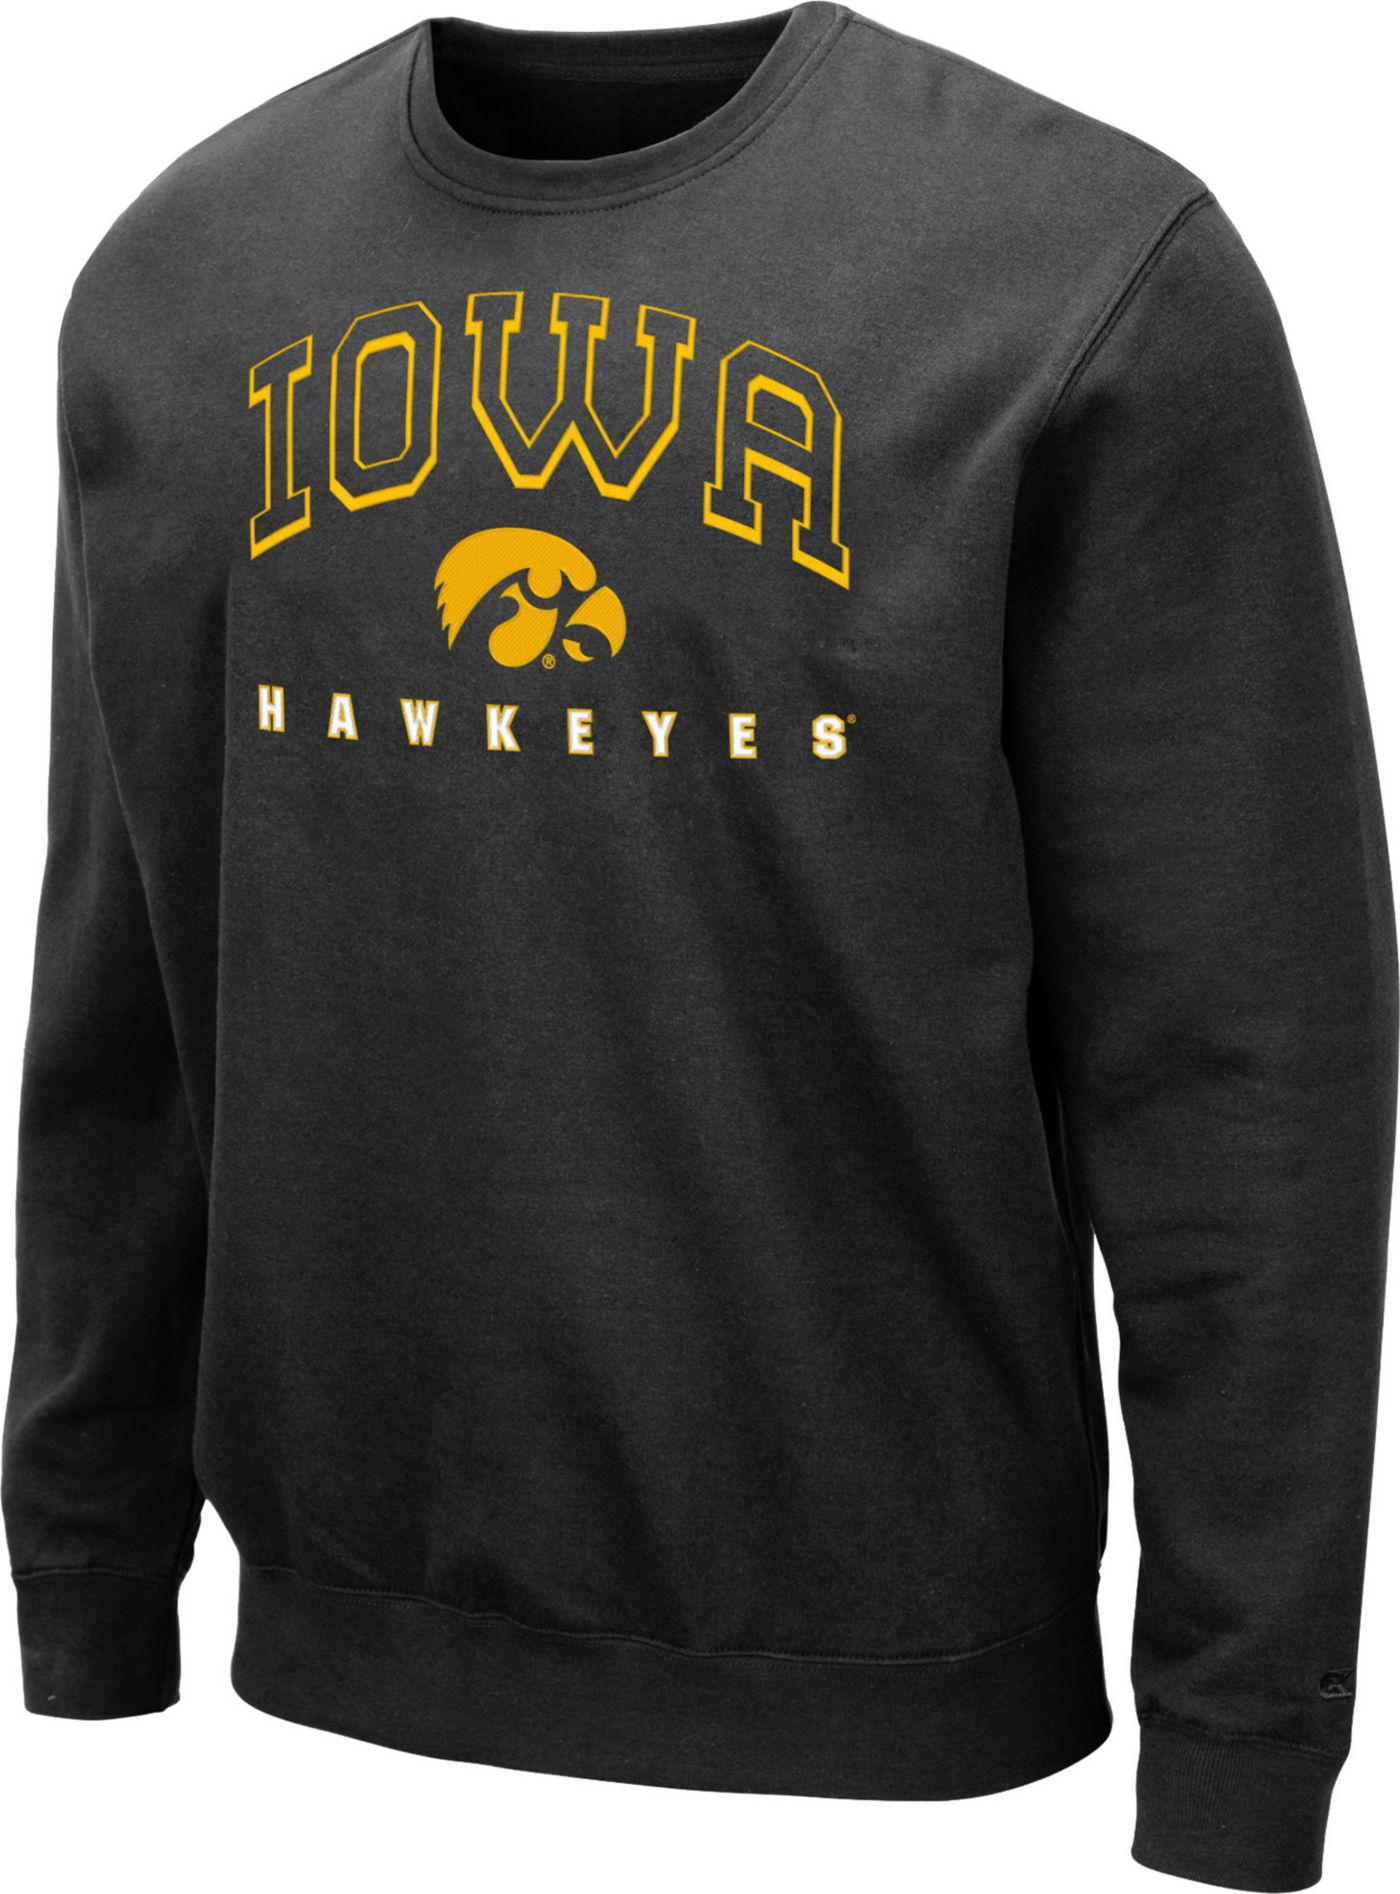 Colosseum Men's Iowa Hawkeyes Comic Book Crew Black Sweatshirt